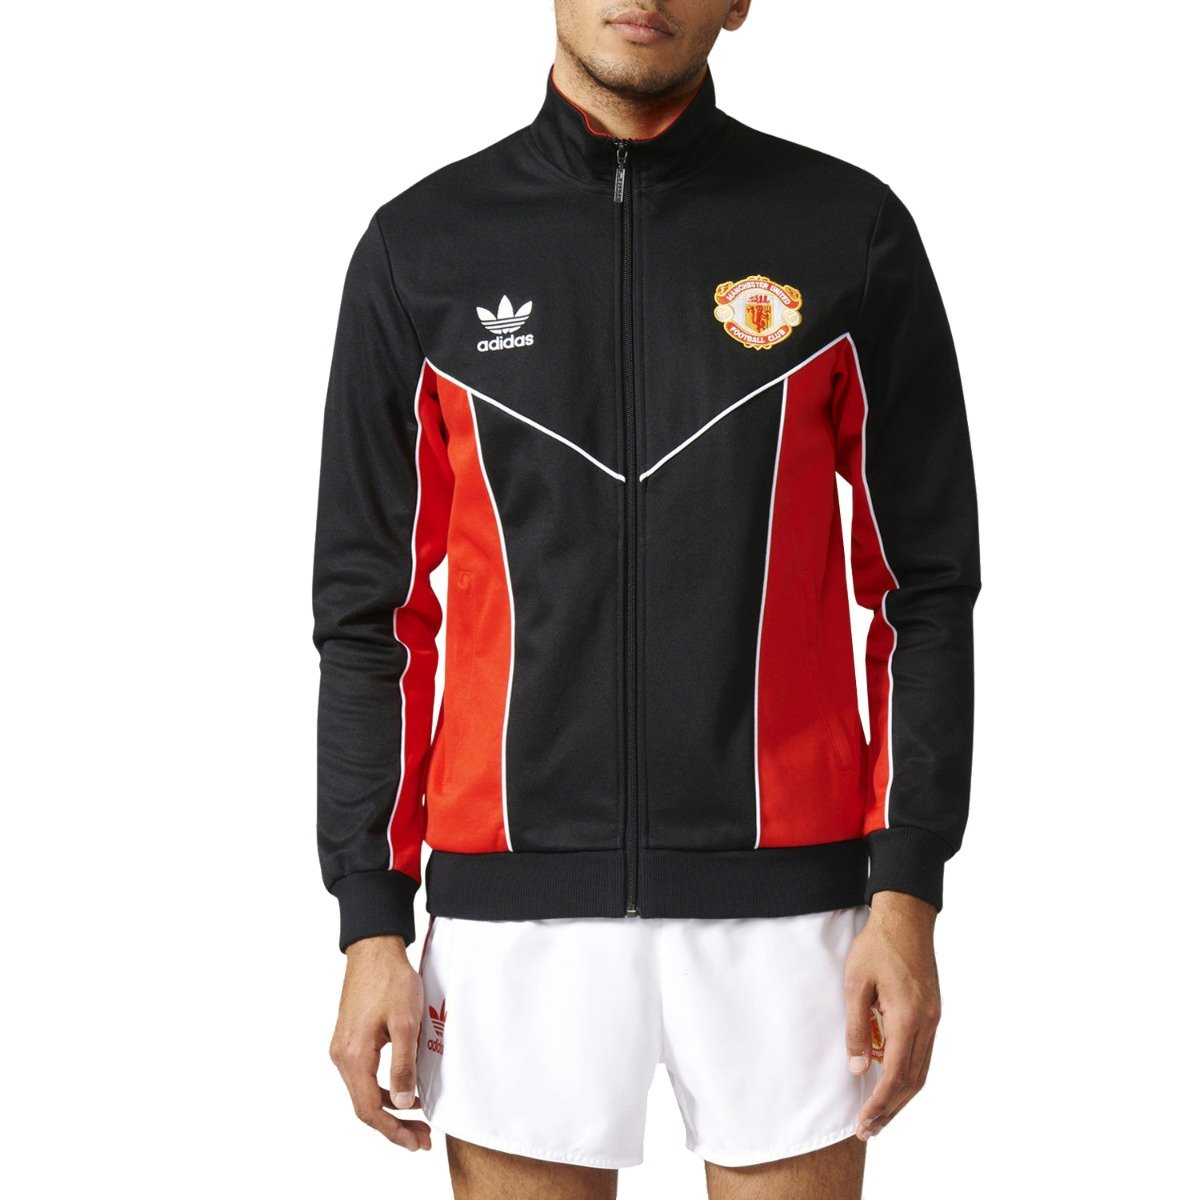 adidas Originals Mens Manchester United '83-'84 Track Jacket